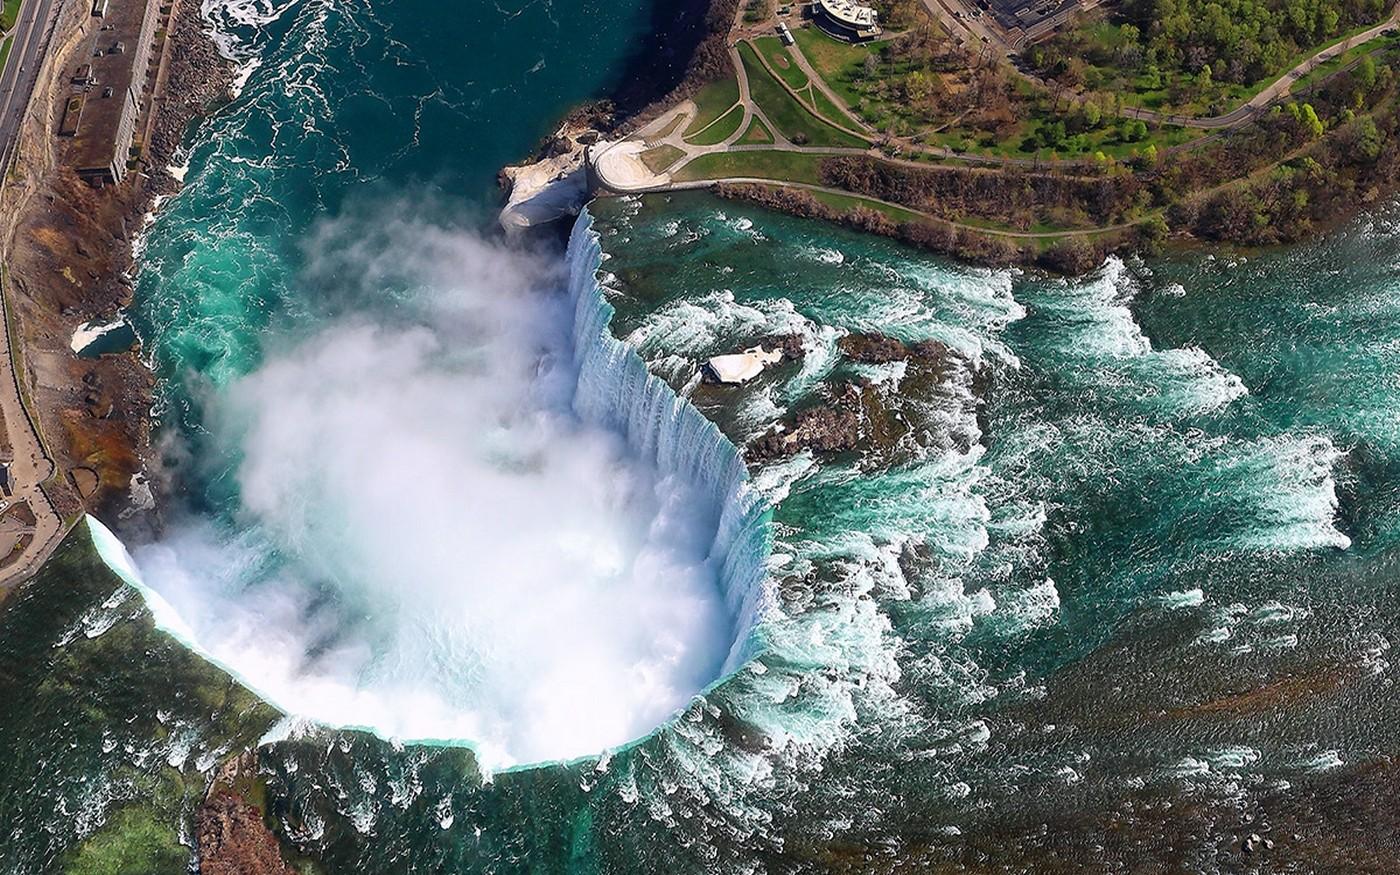 Niagara Falls 4k Wallpaper Landscape Nature Aerial View Niagara Falls Canada